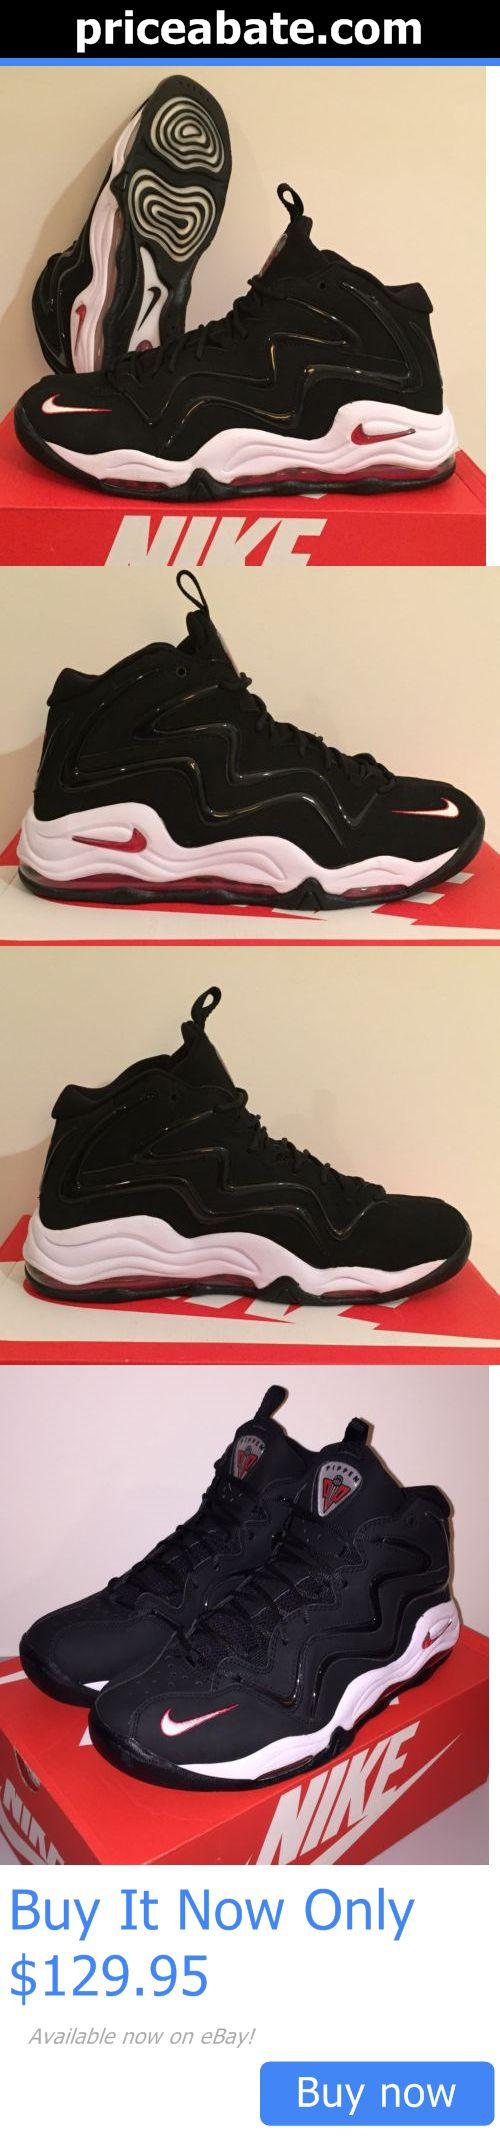 Basketball: Nike Air Pippen 1 Basketball Shoes Bulls Black White Red 14 Nib  BUY IT